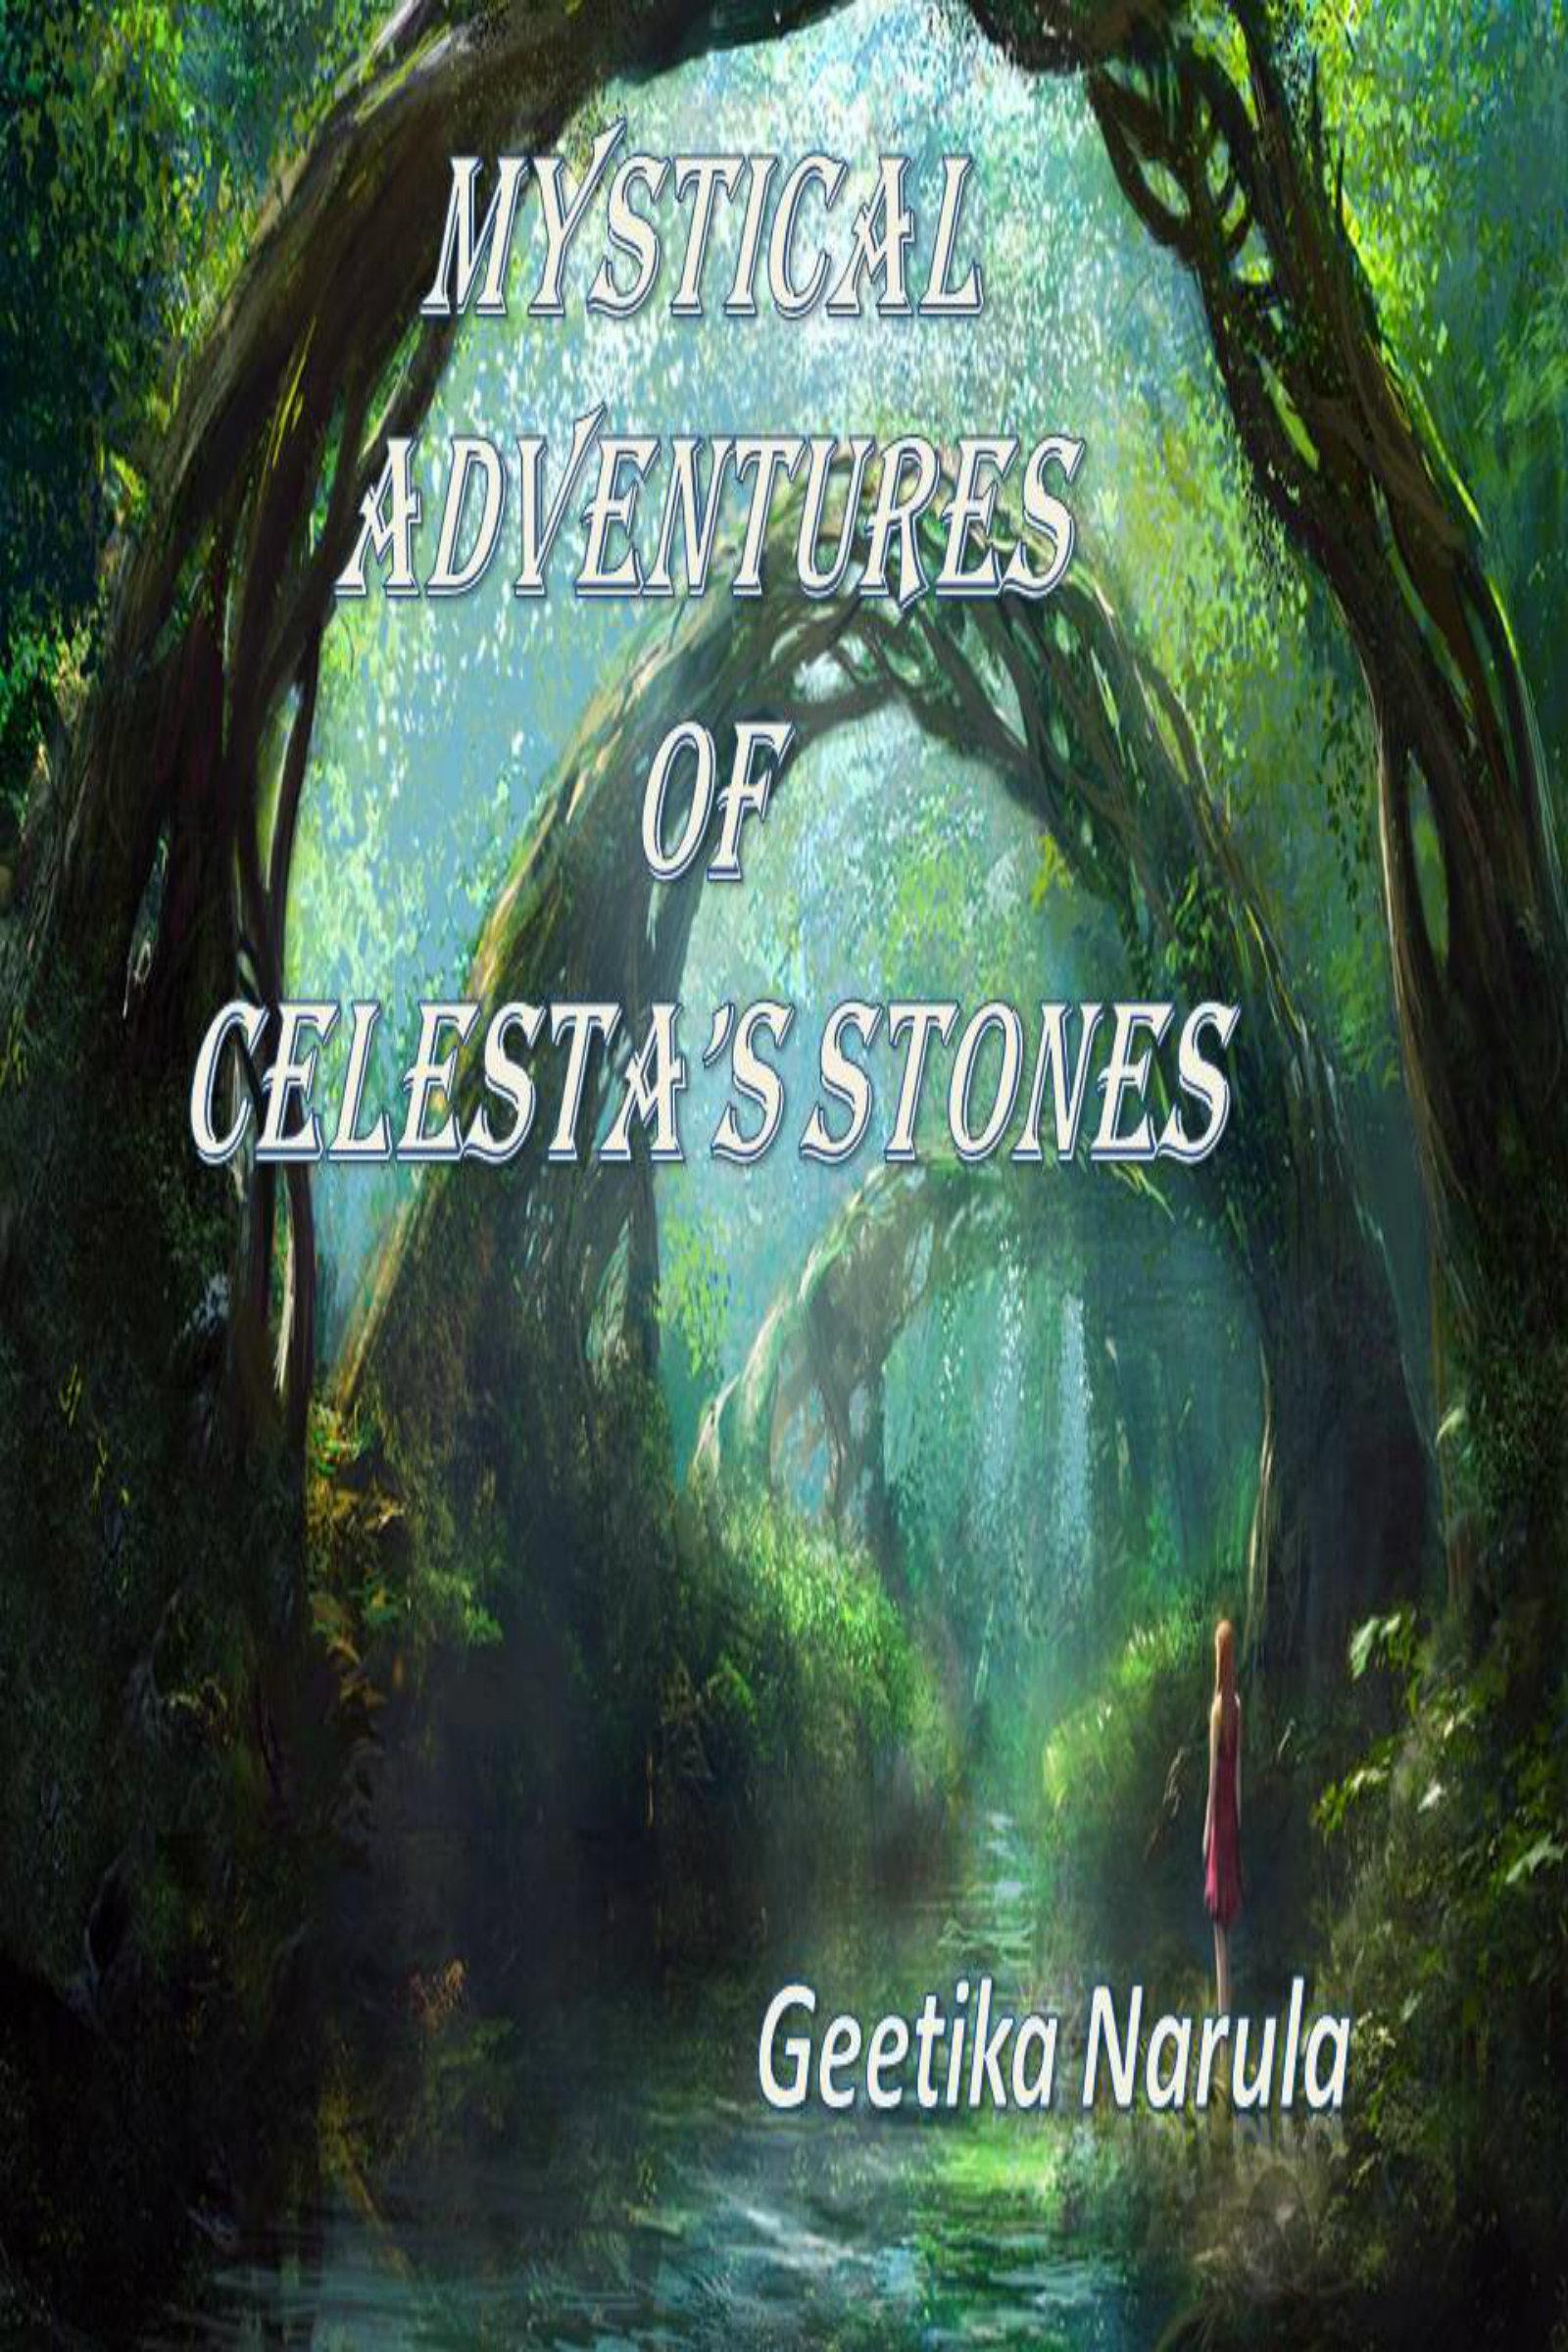 Mystical Adventures Of Celestas Stones Geetika Narula